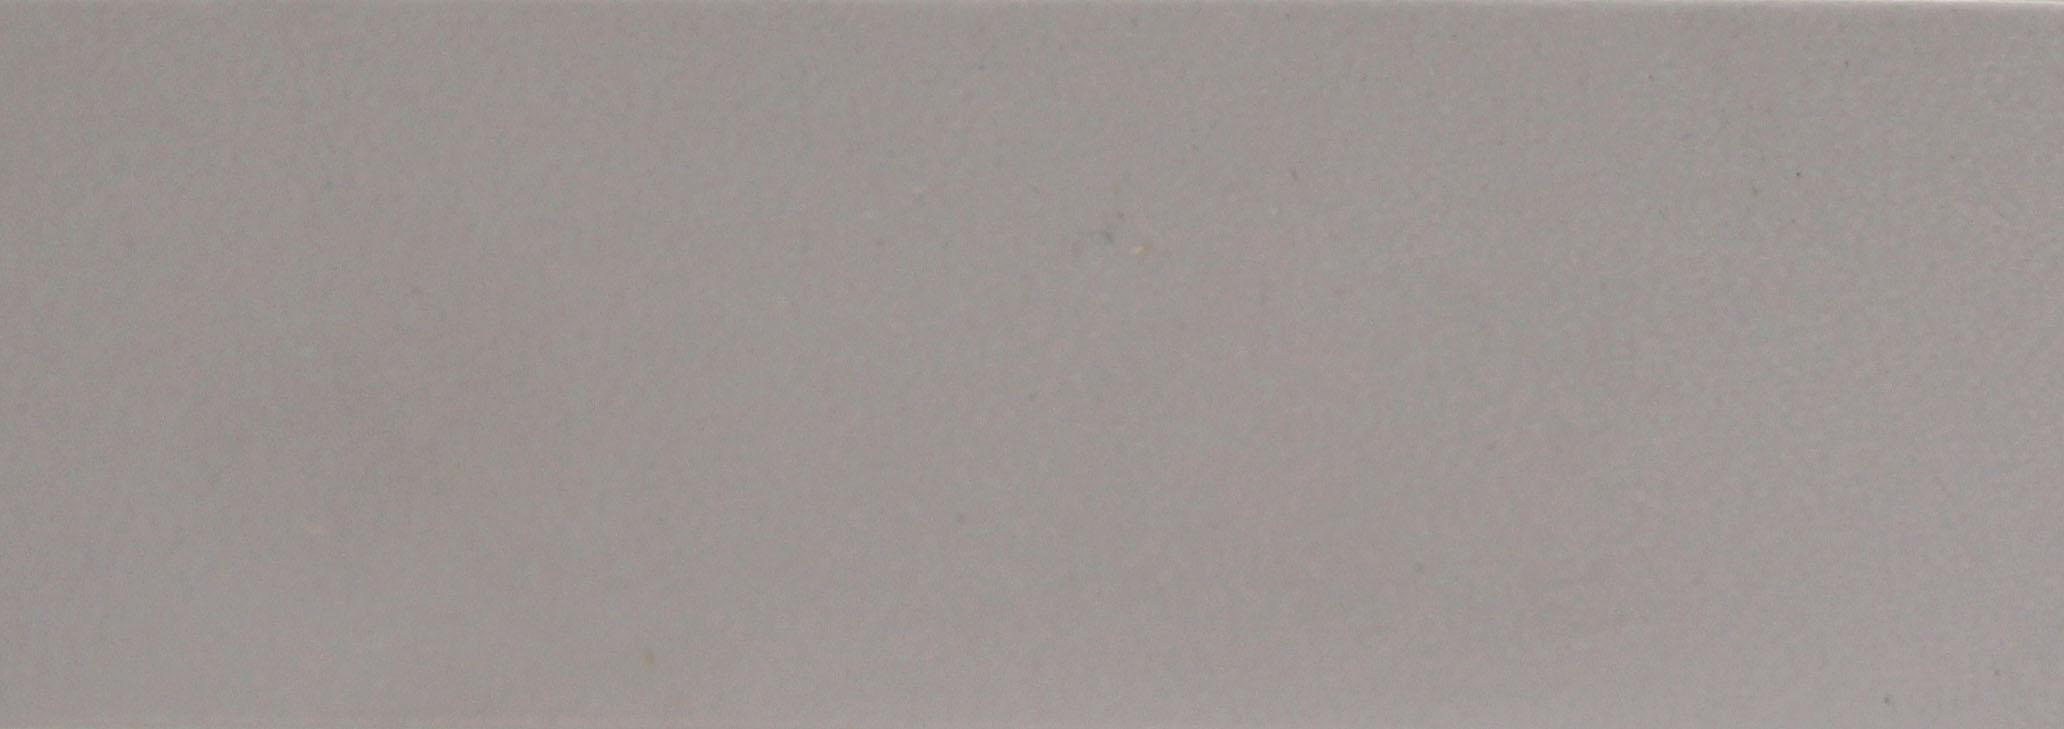 TF021 -  Light Grey  22 x 1 mm, 22 x 2 mm